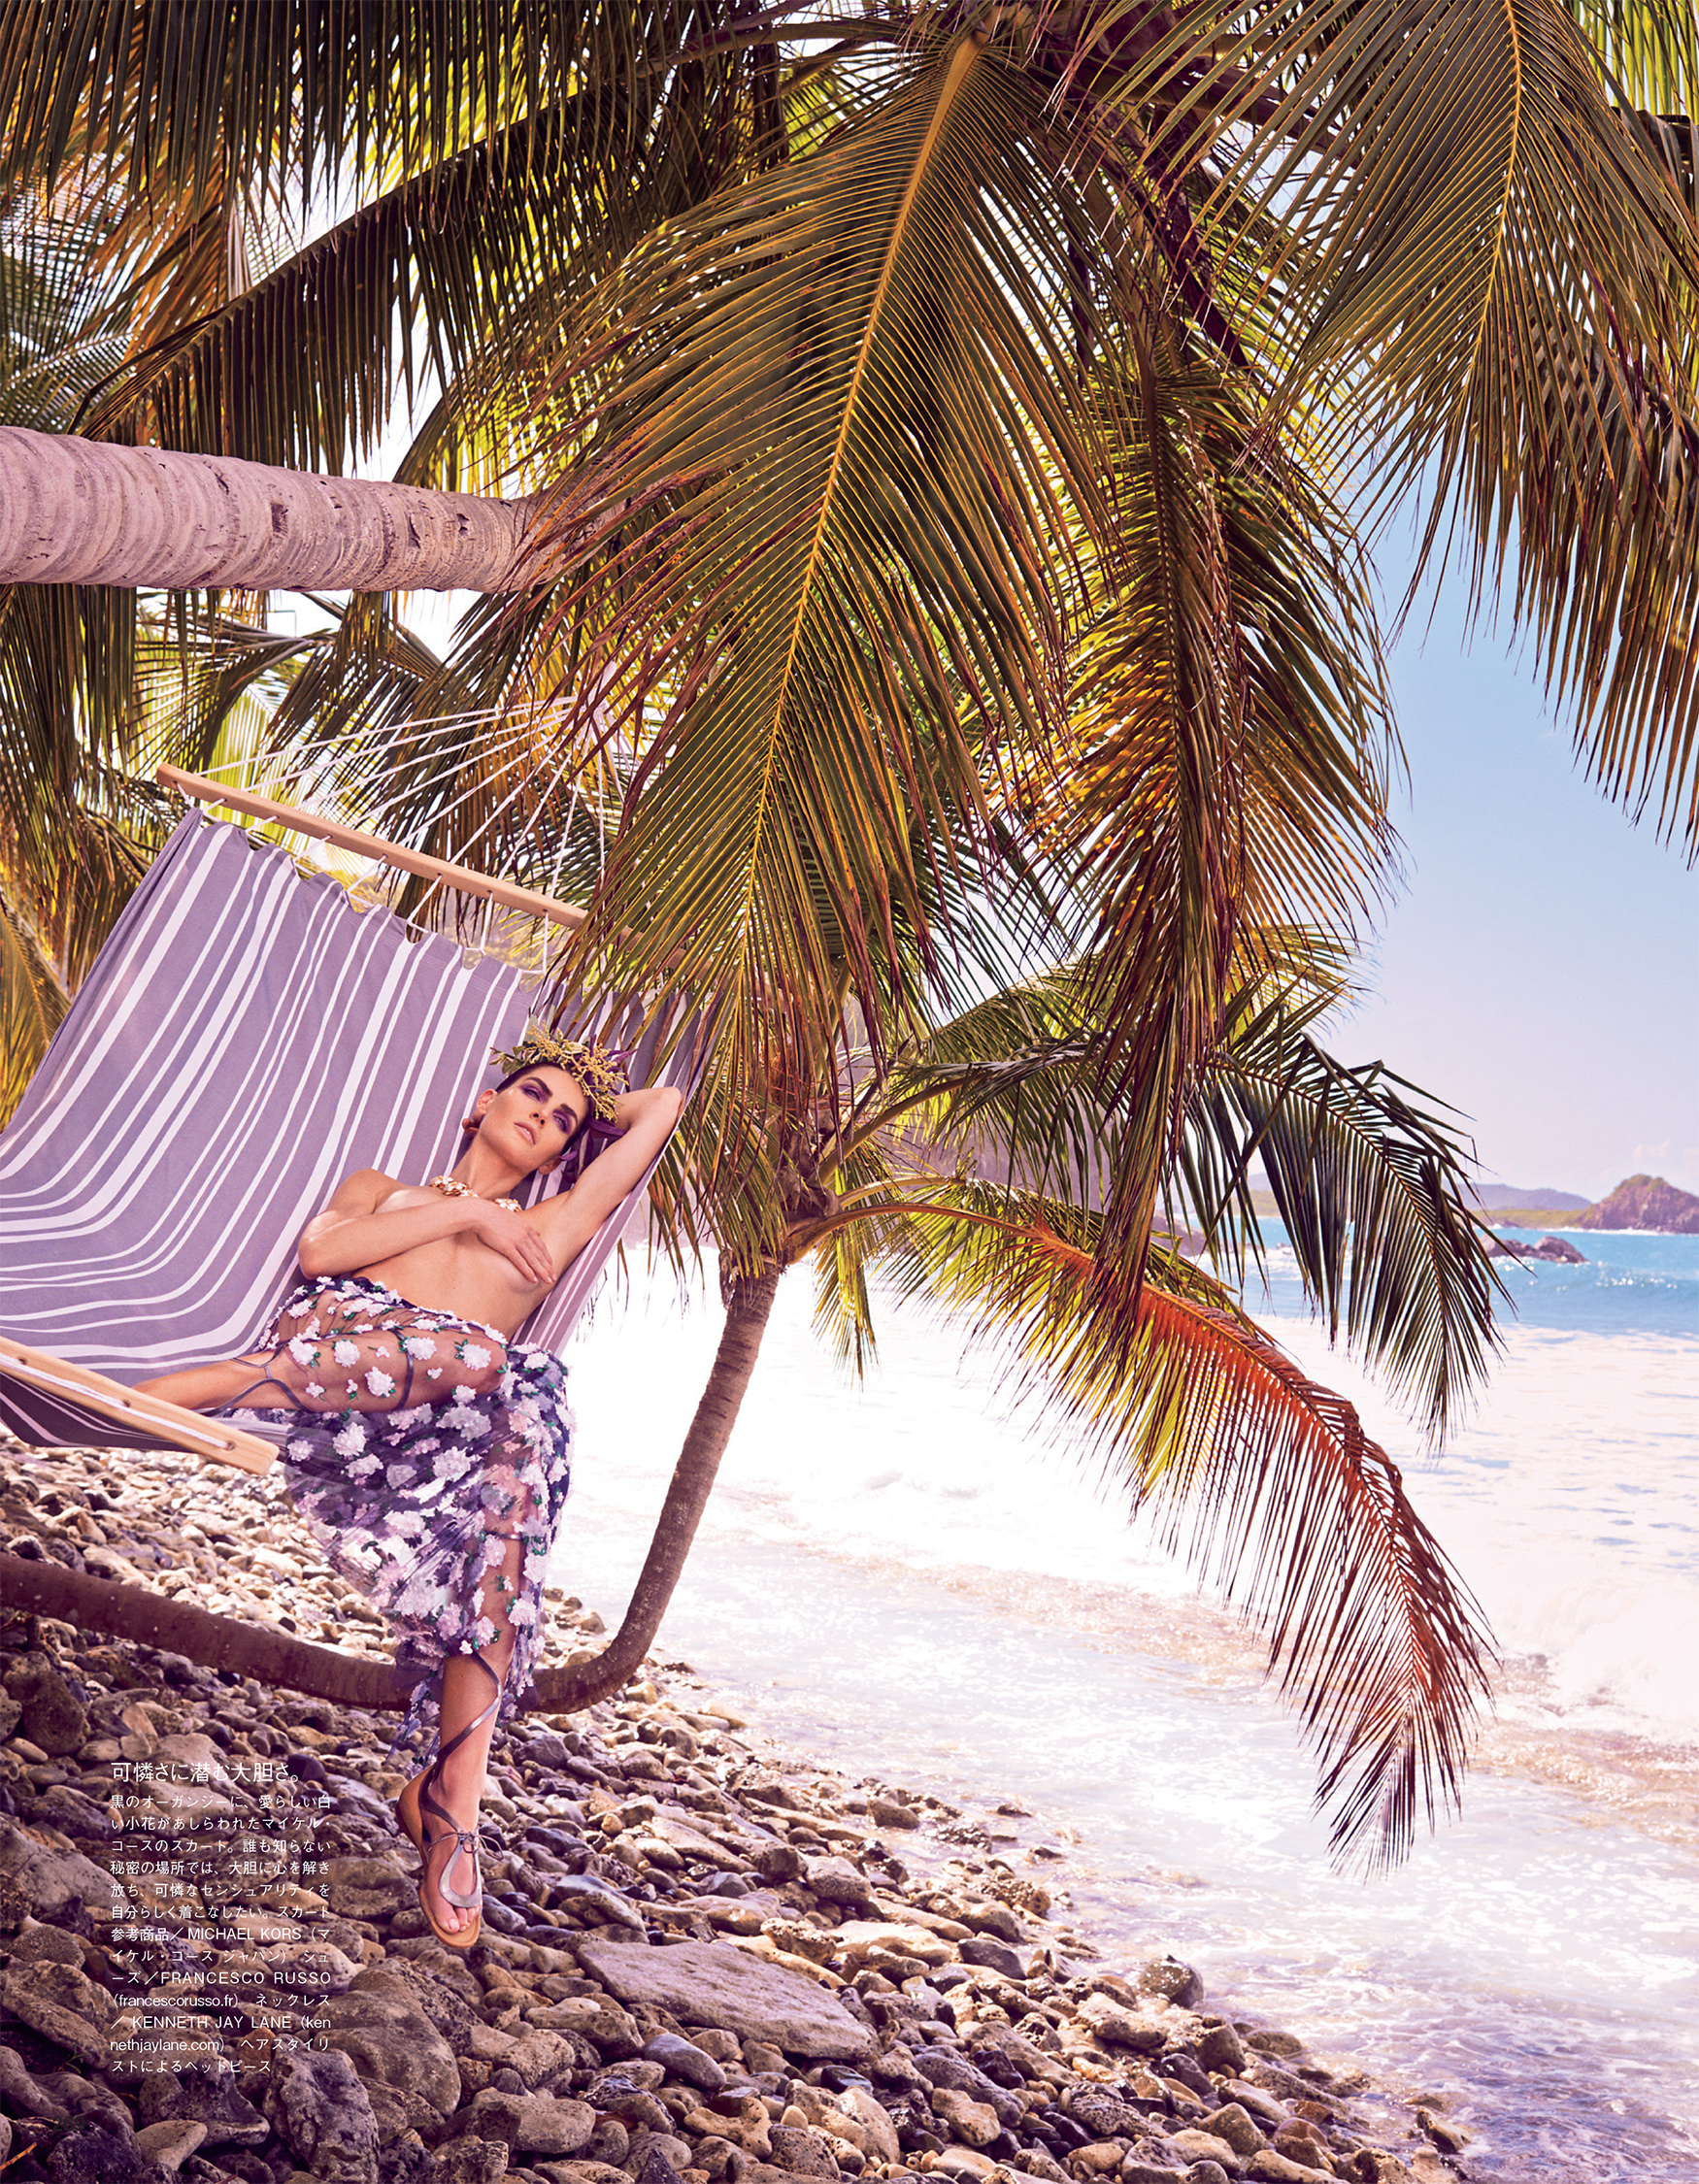 Giovanna-Battaglia-Vogue-Japan-Mariano-Vivanco-Forbidden-Paradise-11.jpg